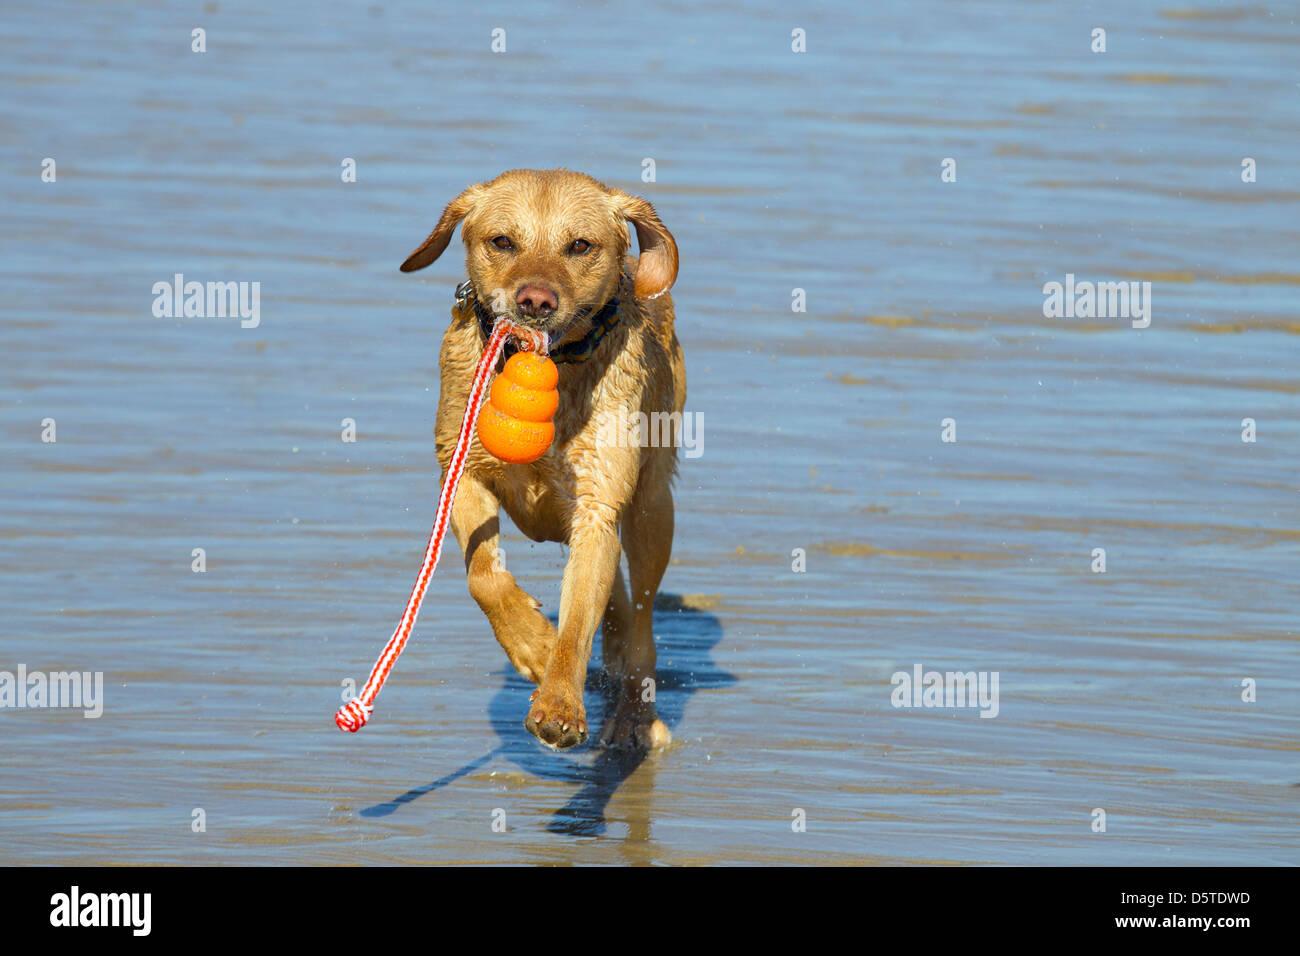 Yellow Labrador playing with ball - Stock Image